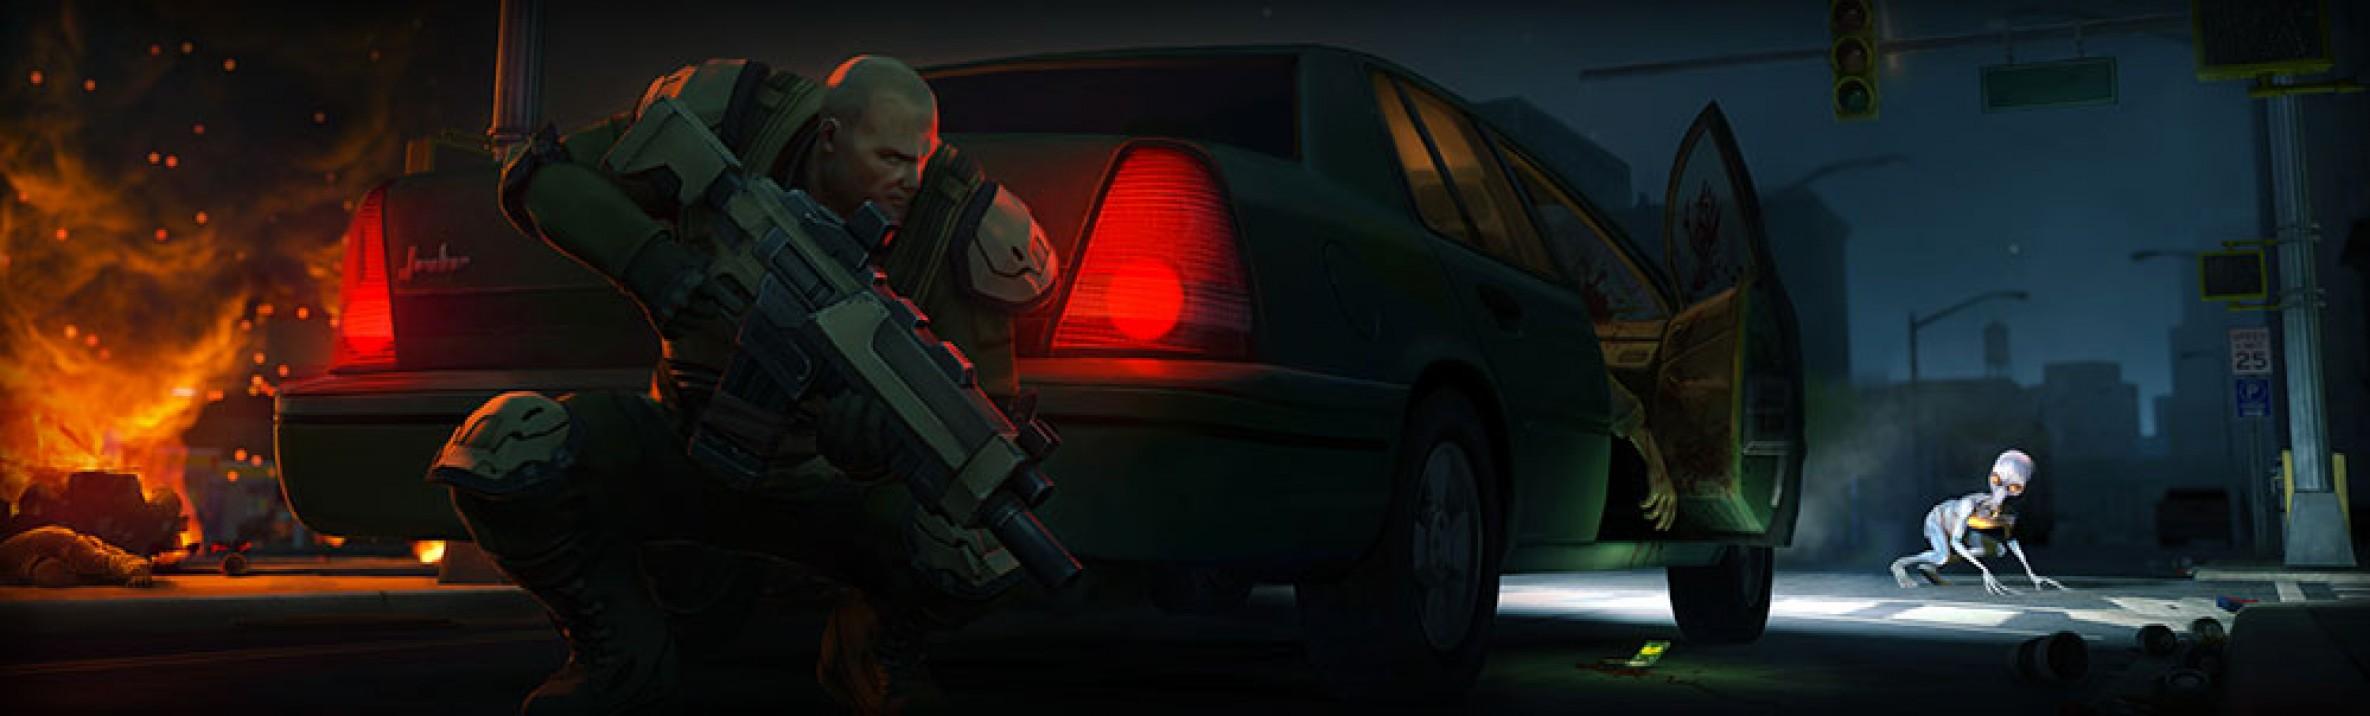 XCOM: Enemy Unknown - Elite Edition Mac sur MacGames.fr